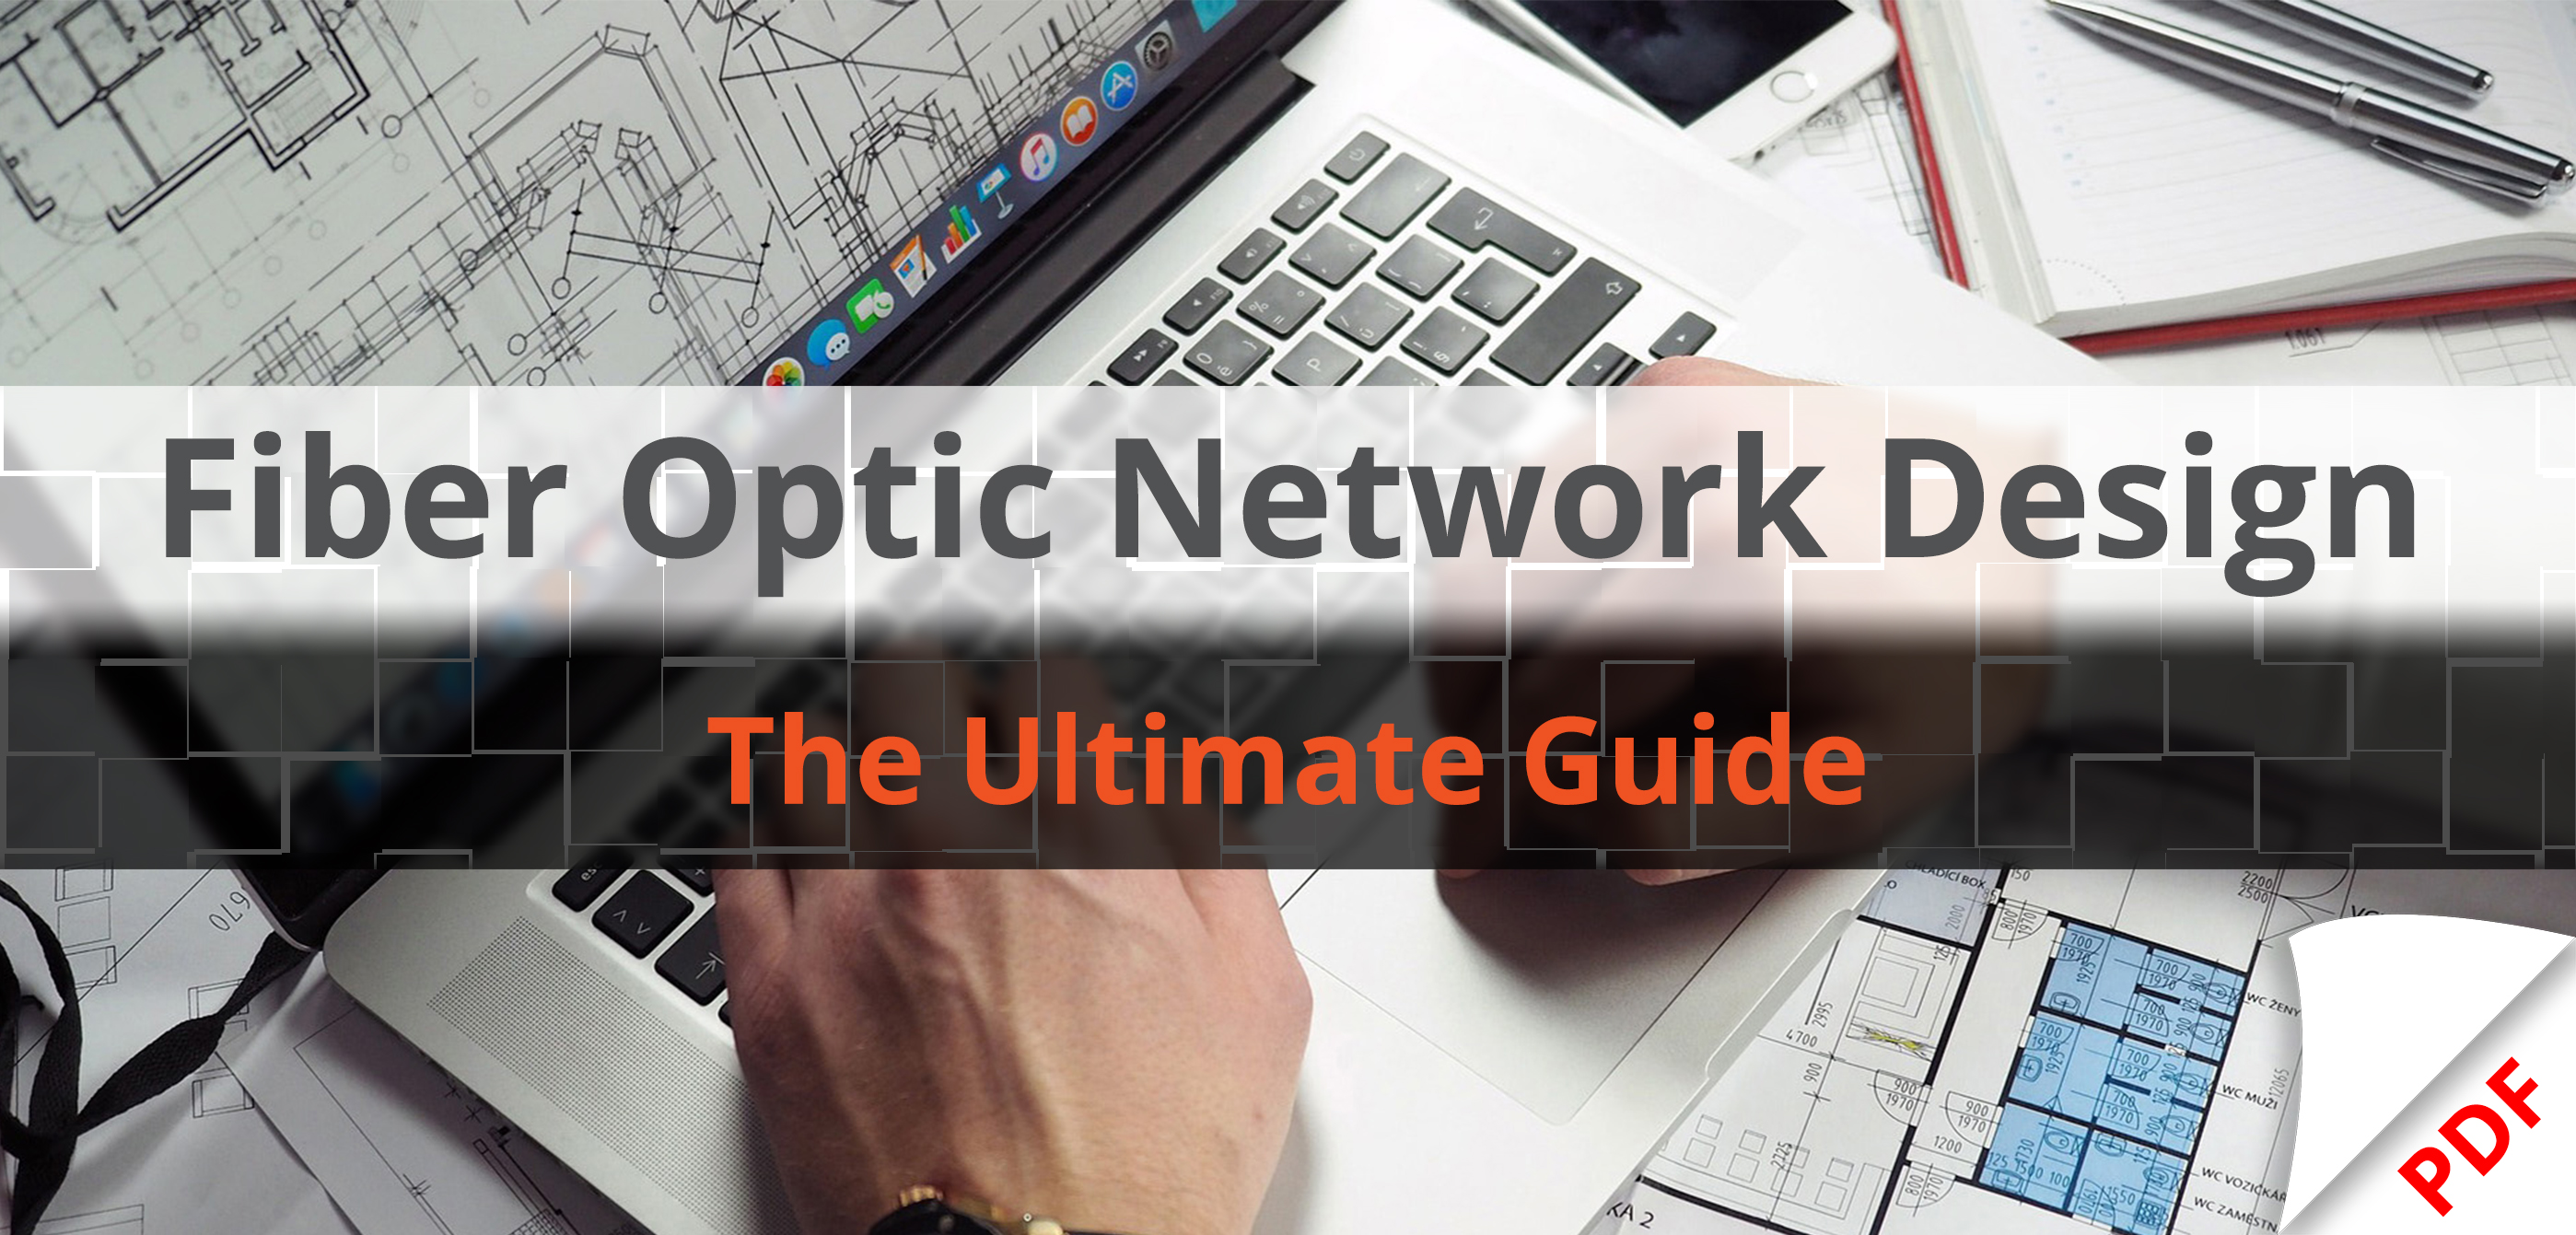 PDF Download - Fiber Optic Network Design - Landing Page (featured image)